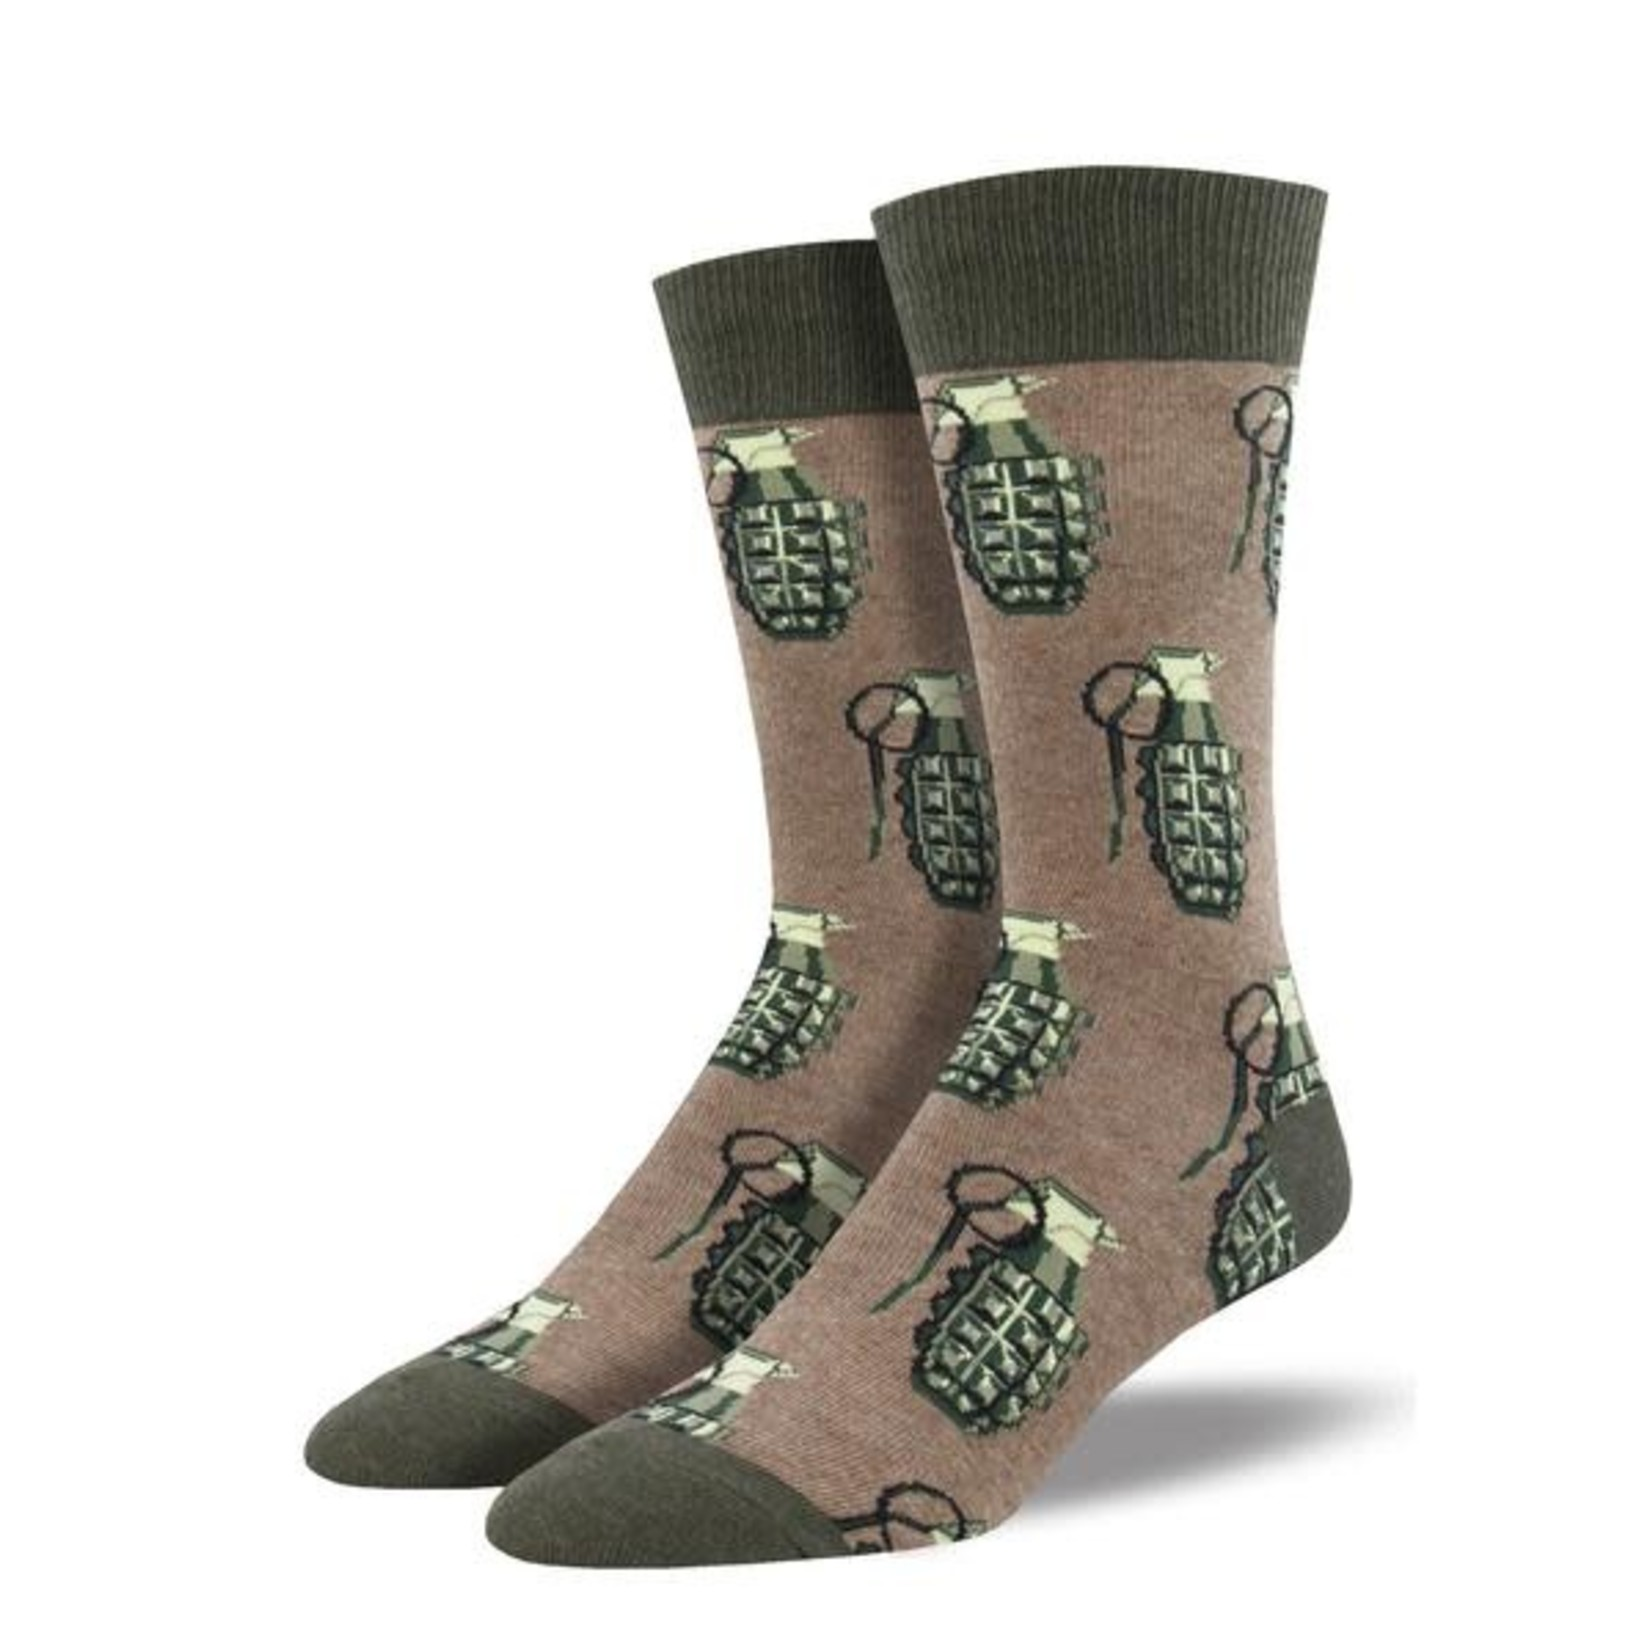 SockSmith Men's Pattern Crew Socks